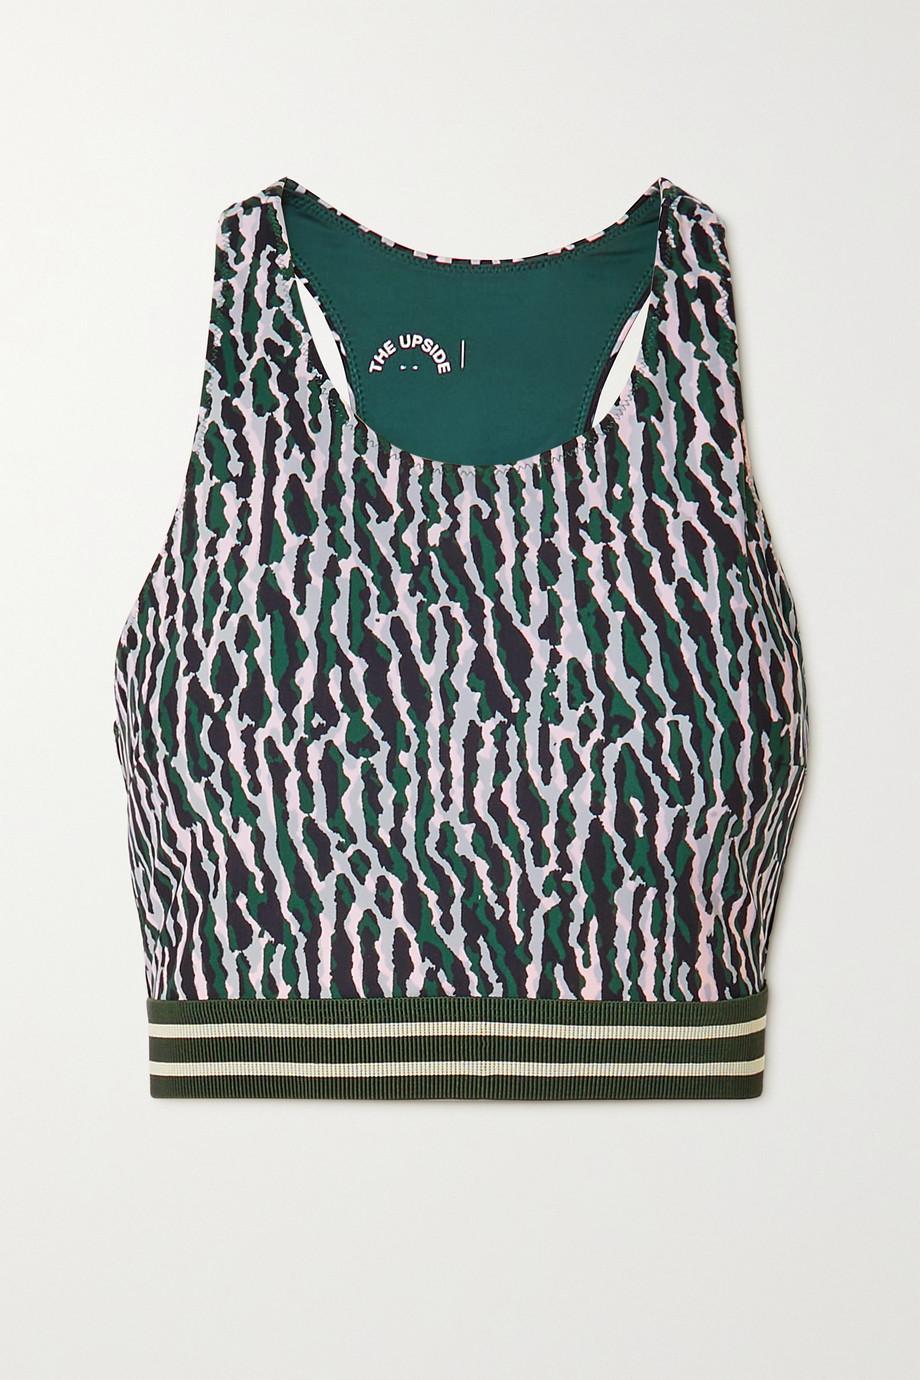 The Upside Bianca camouflage-print stretch sports bra